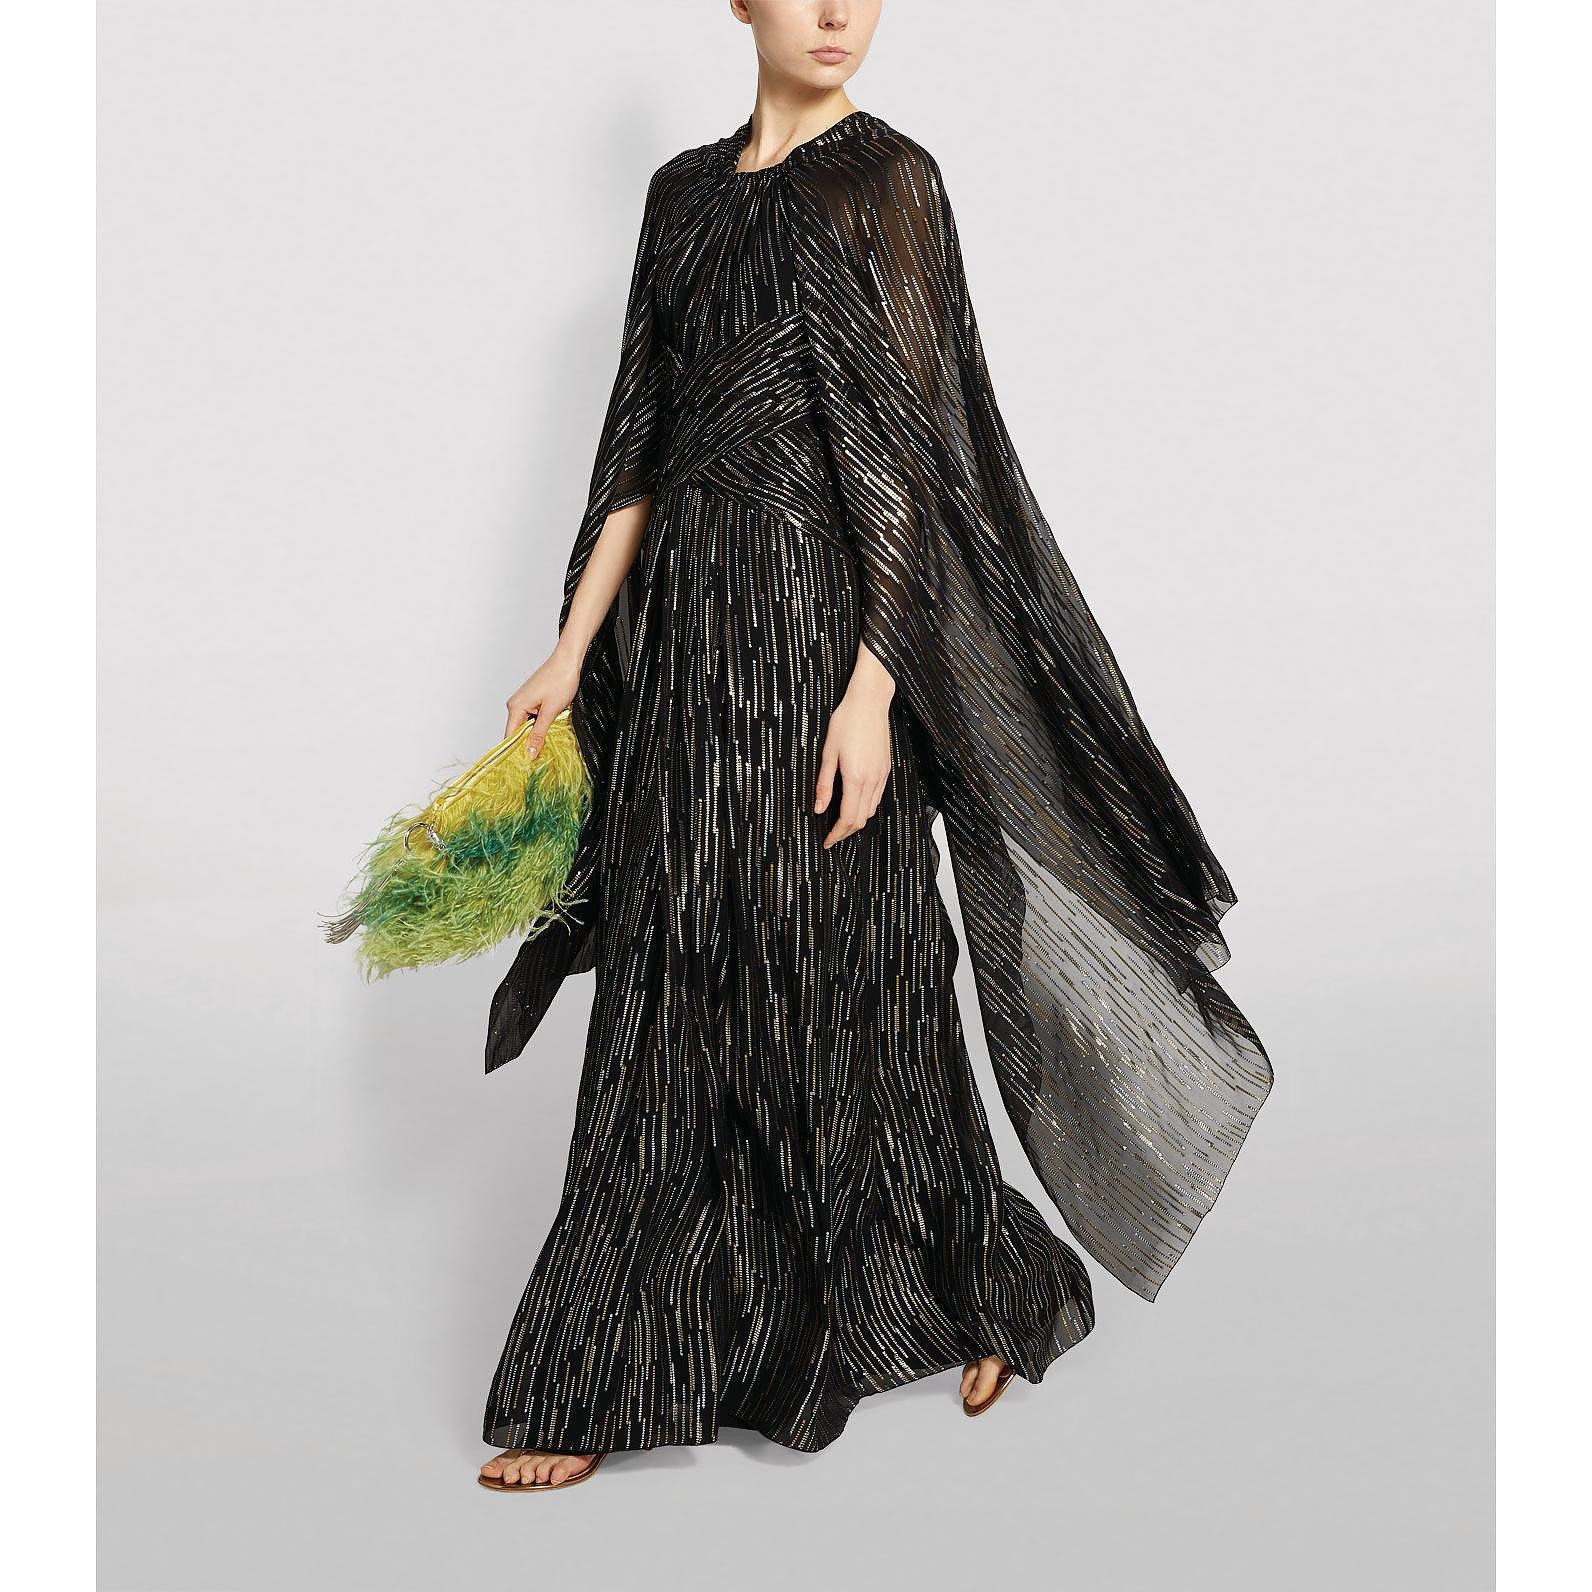 Peter Pilotto Caped Silk-Lurex Gown